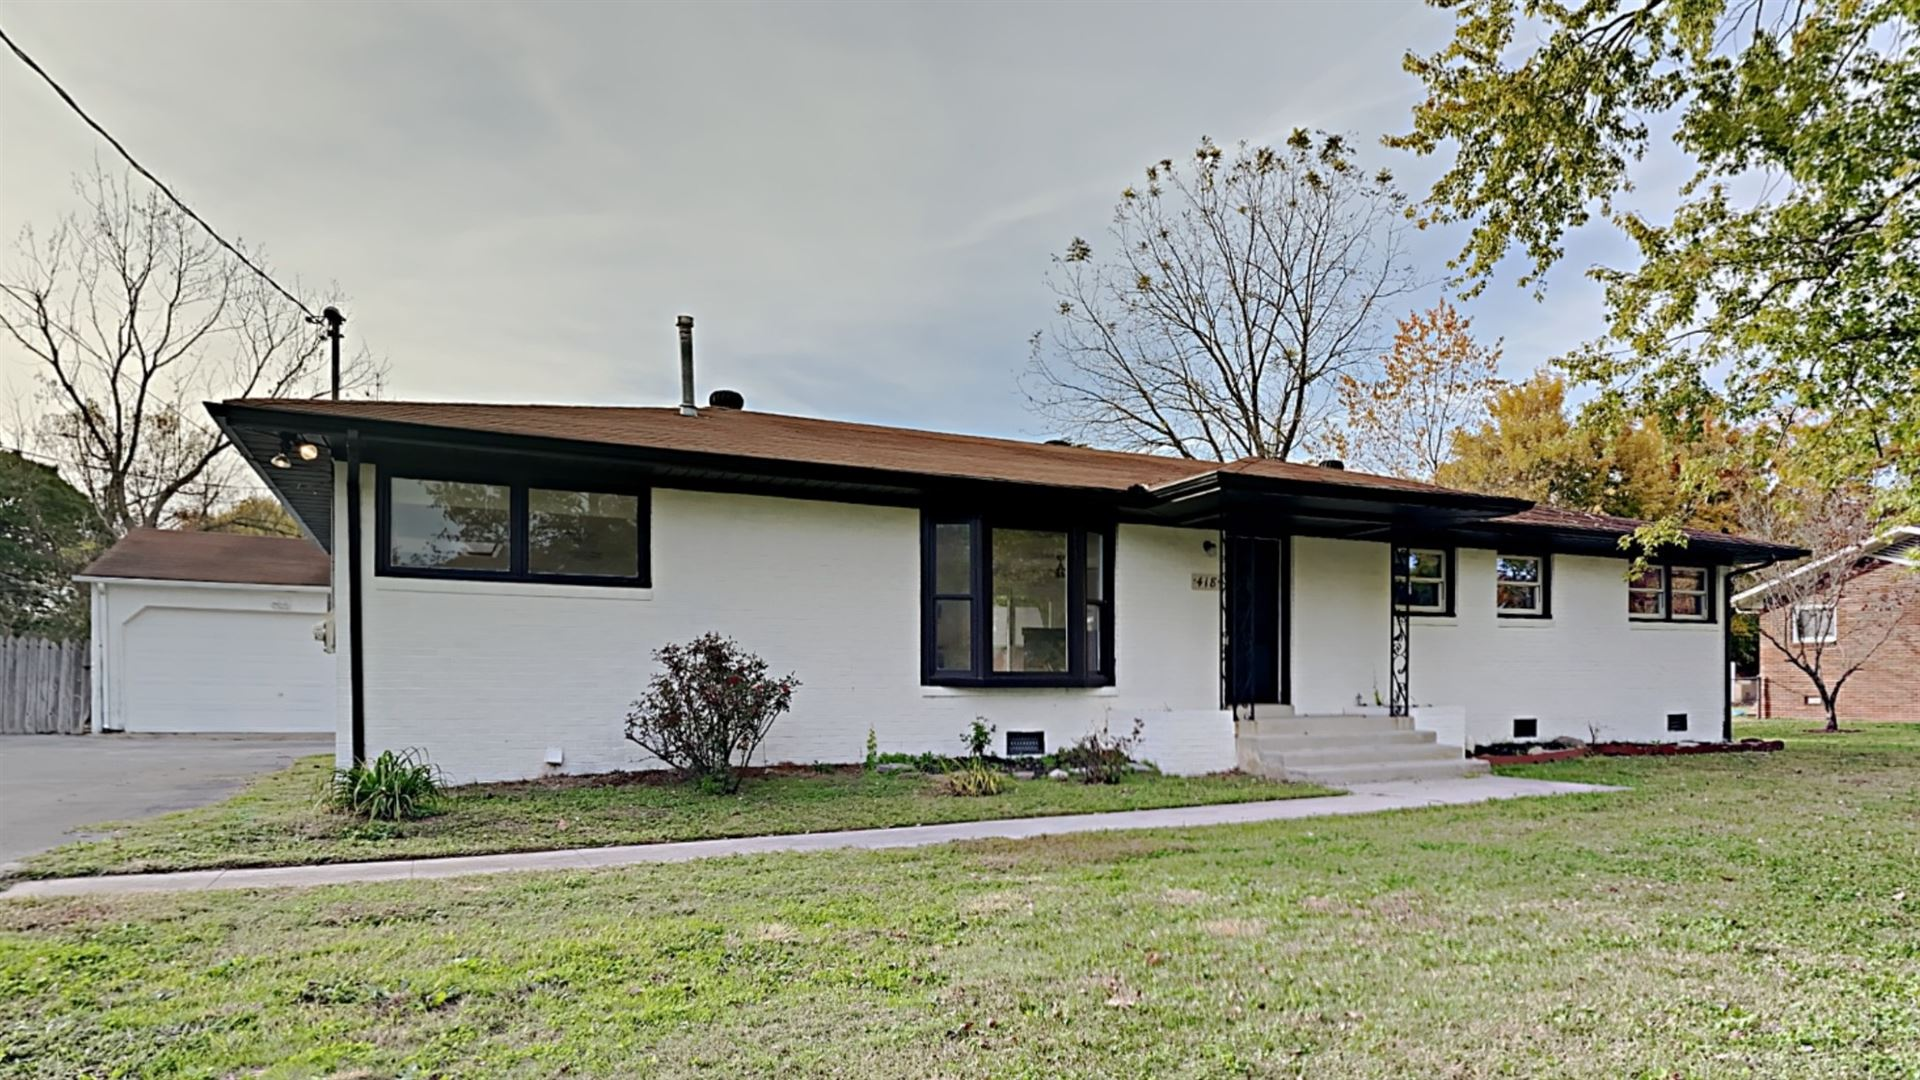 418 S Baird Ln, Murfreesboro, TN 37130 - MLS#: 2294461